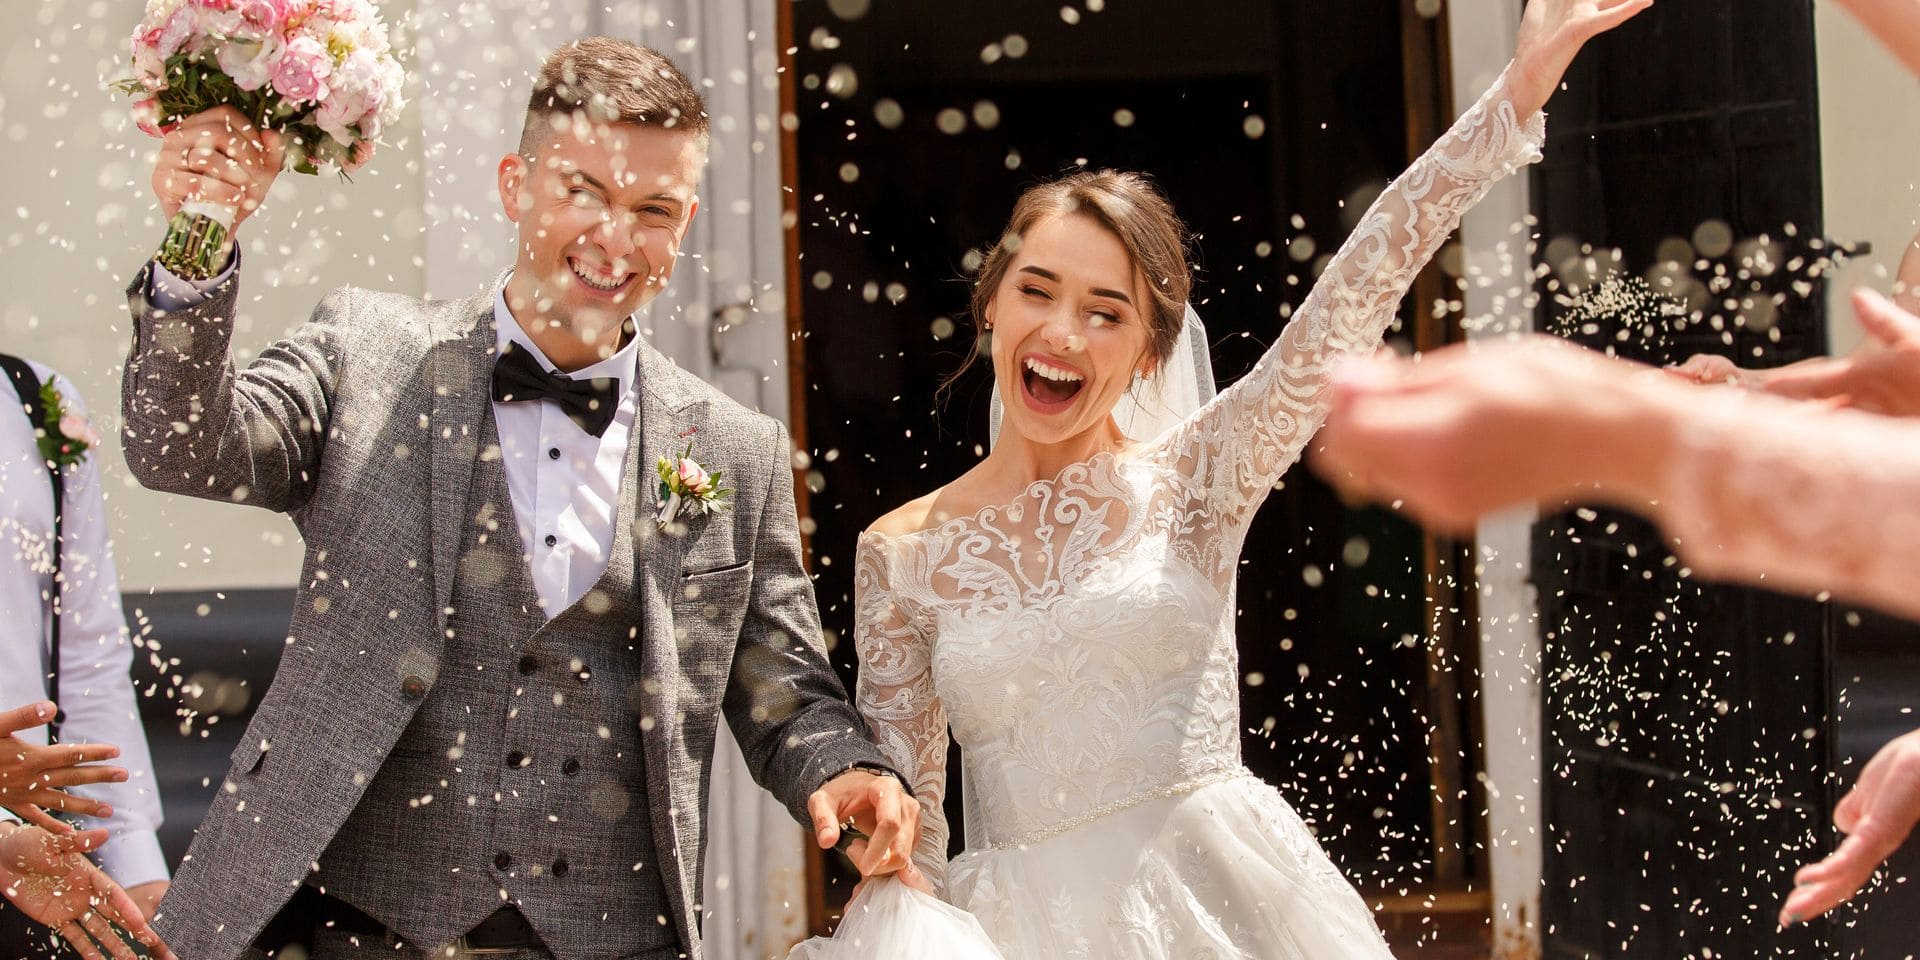 Happy,Wedding,Photography,Of,Bride,And,Groom,At,Wedding,Ceremony.